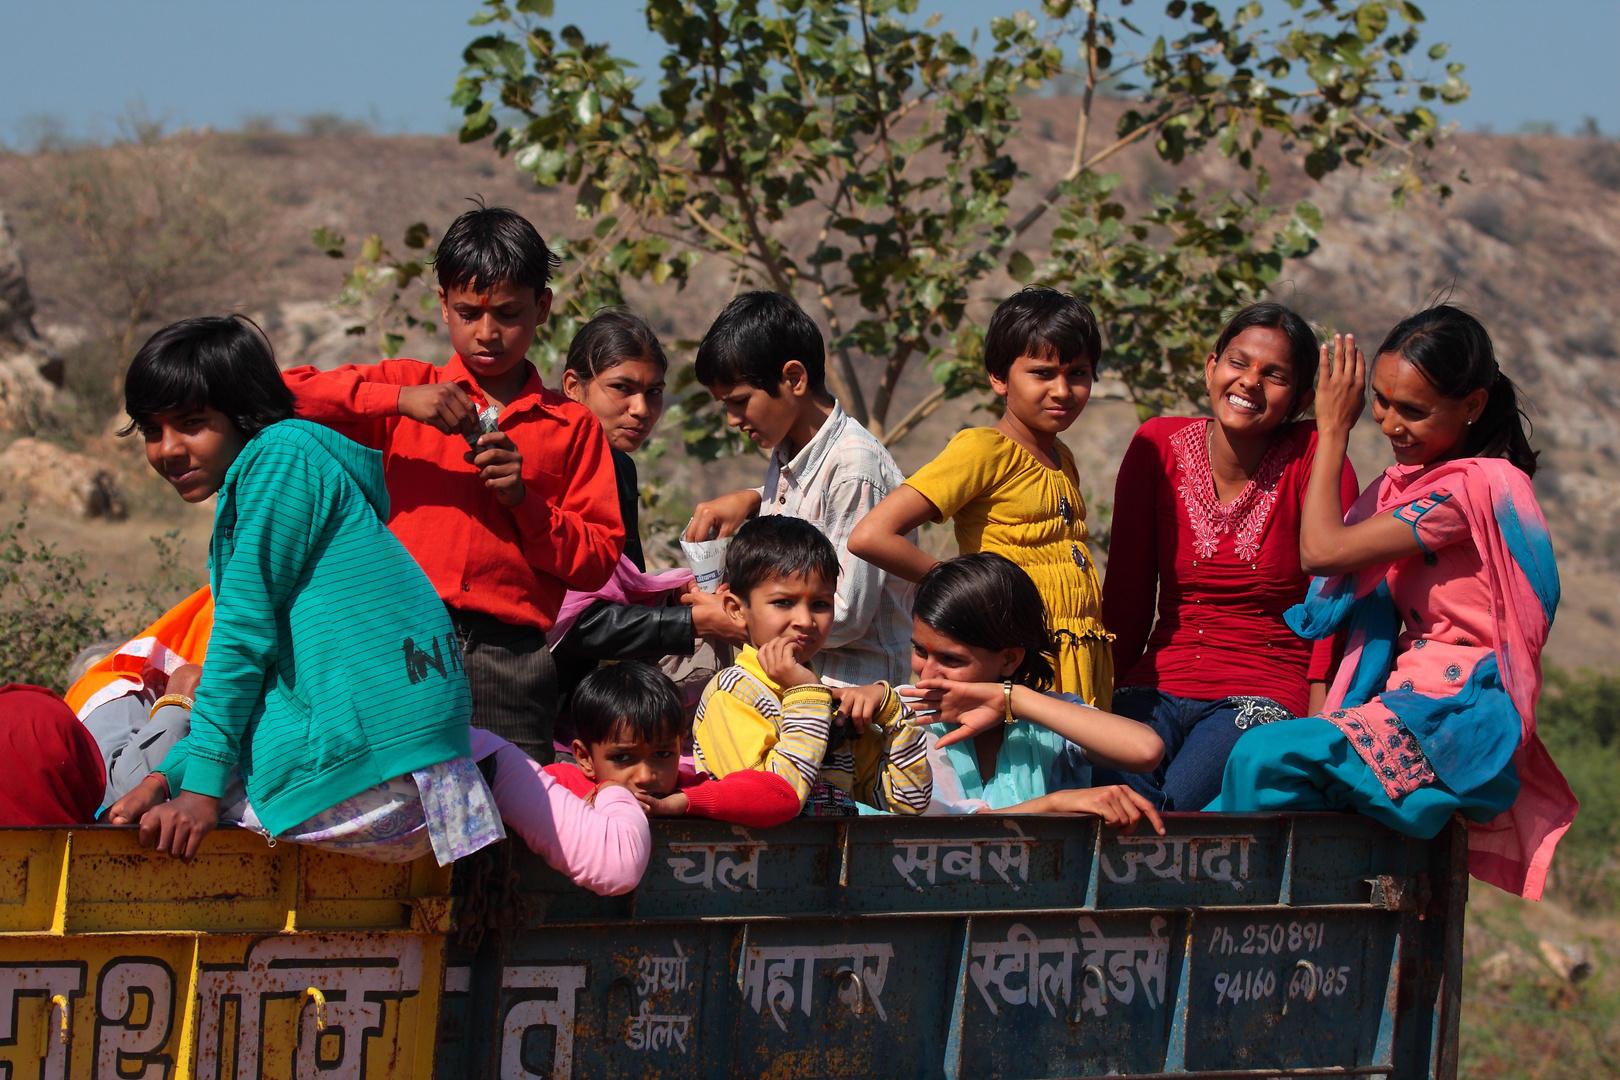 Dans la campagne du Rajasthan.